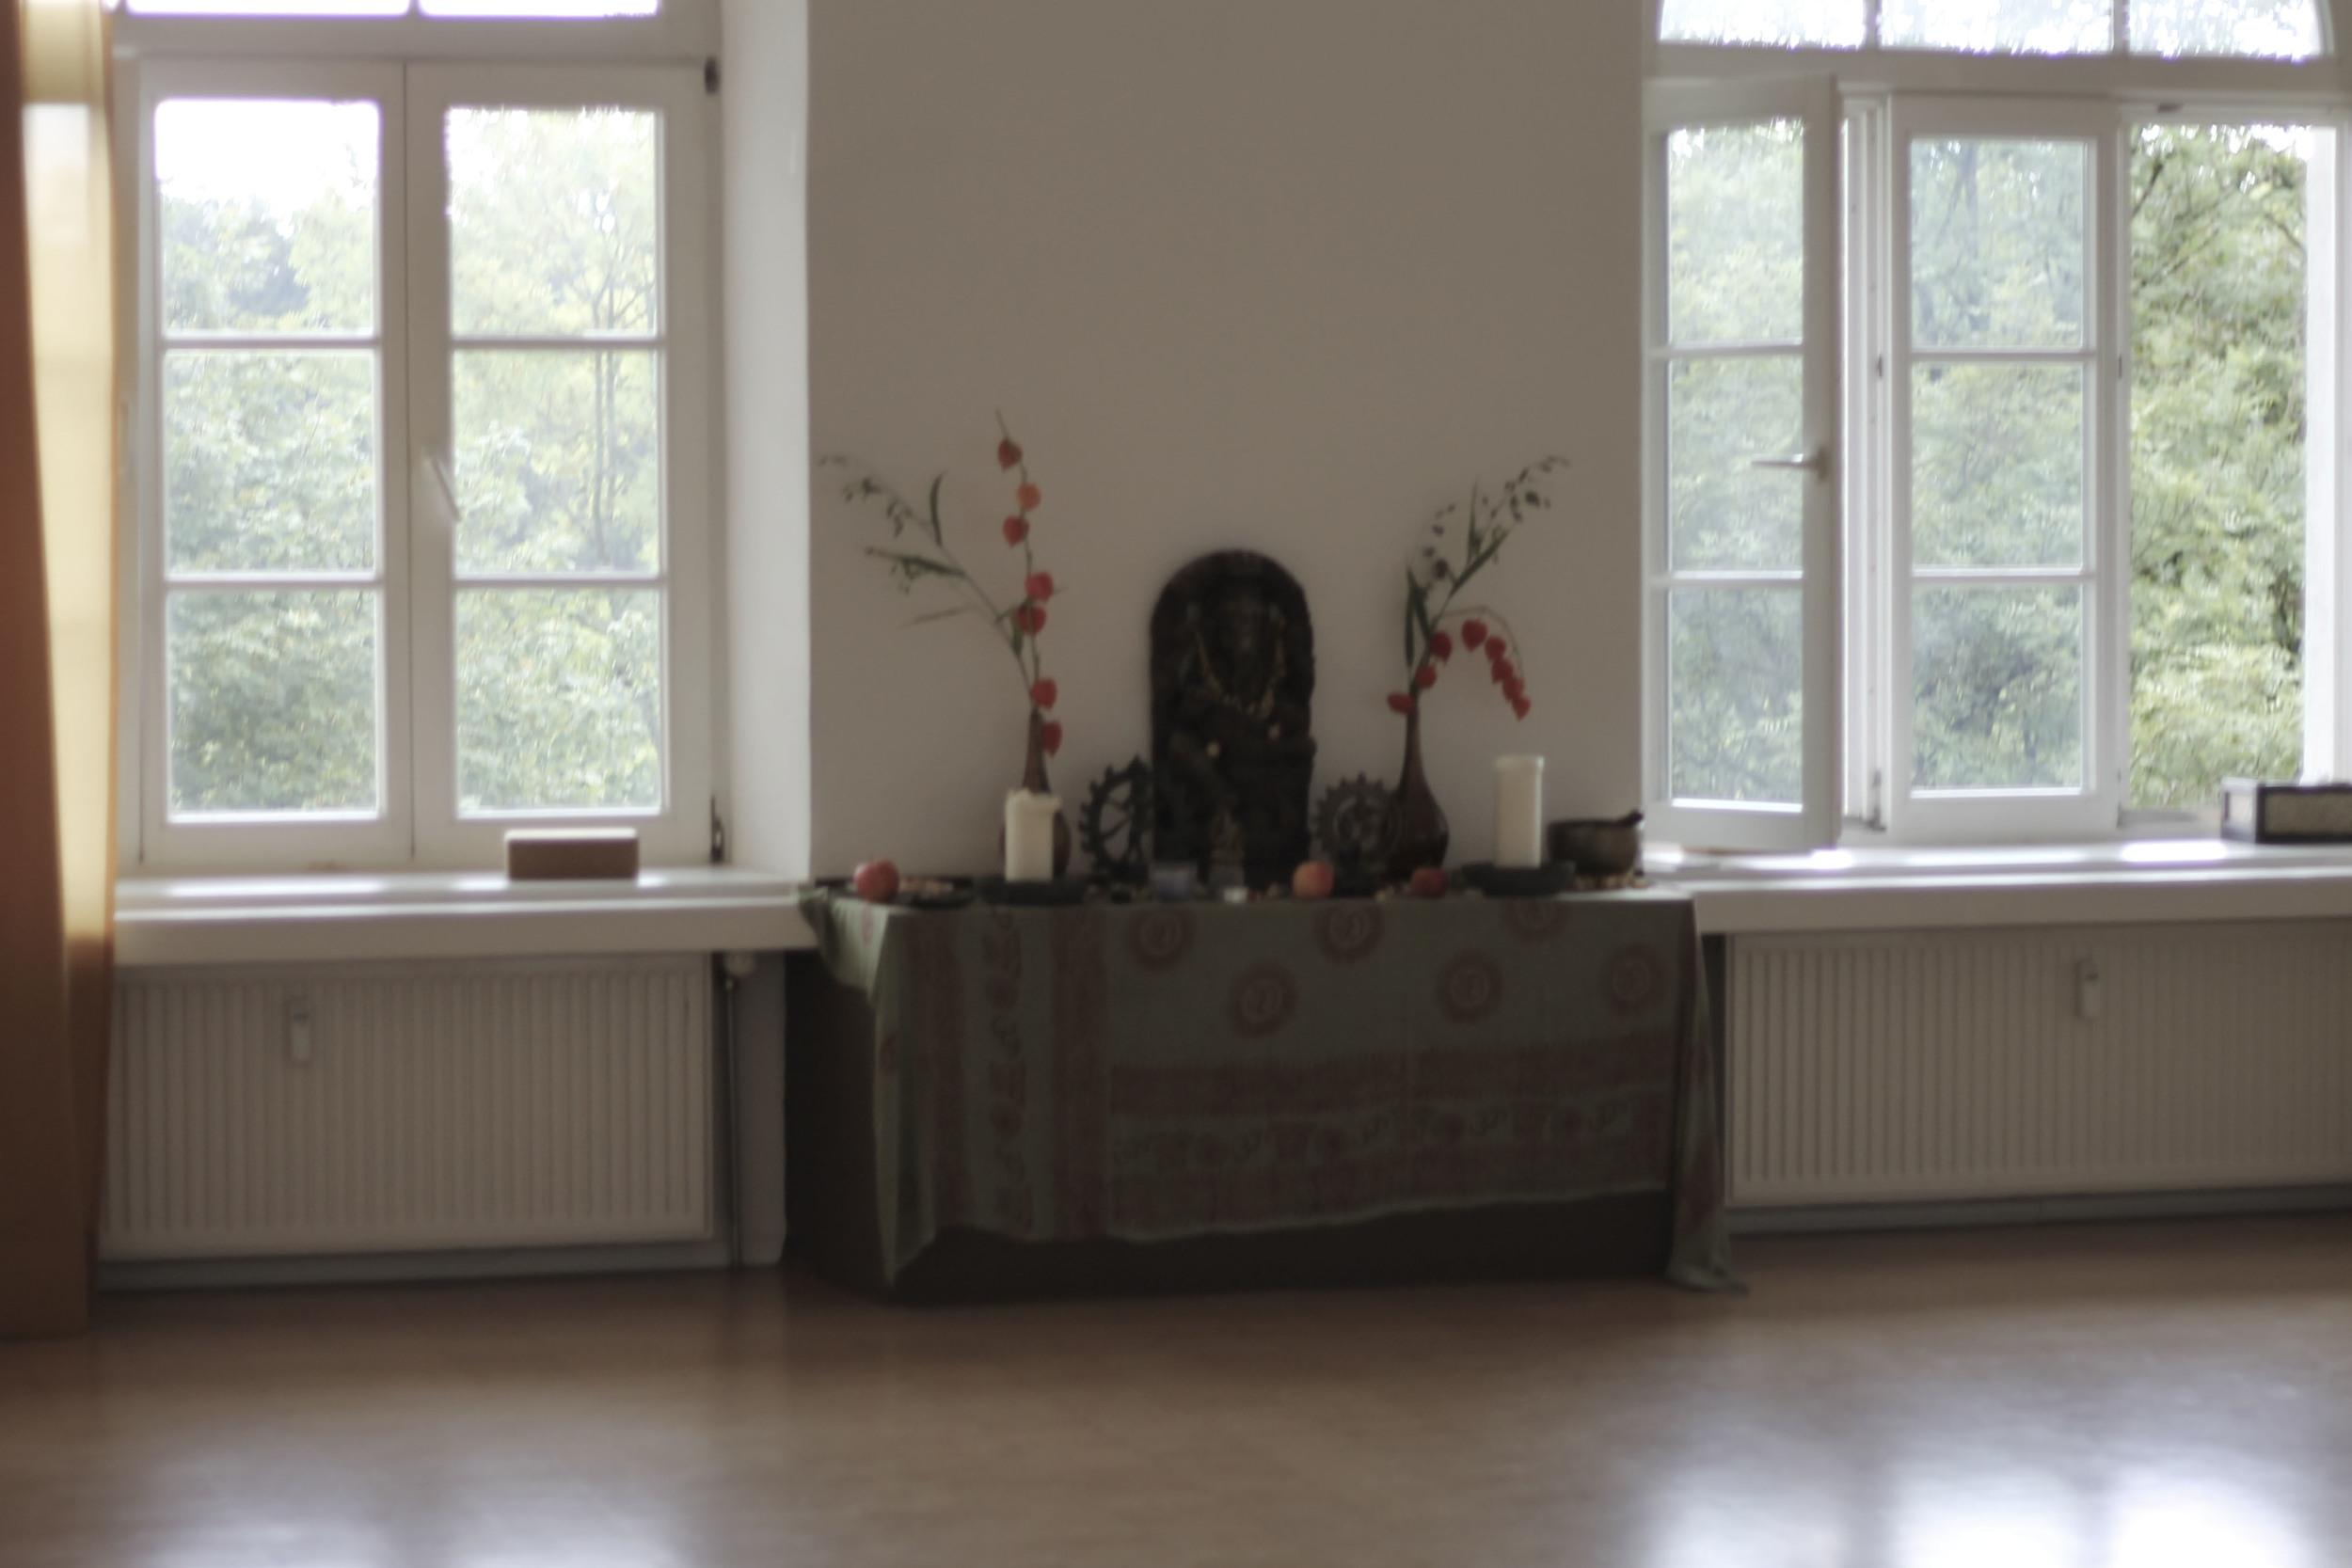 Yogalounge Pullach Yoga München Anusara27.jpg